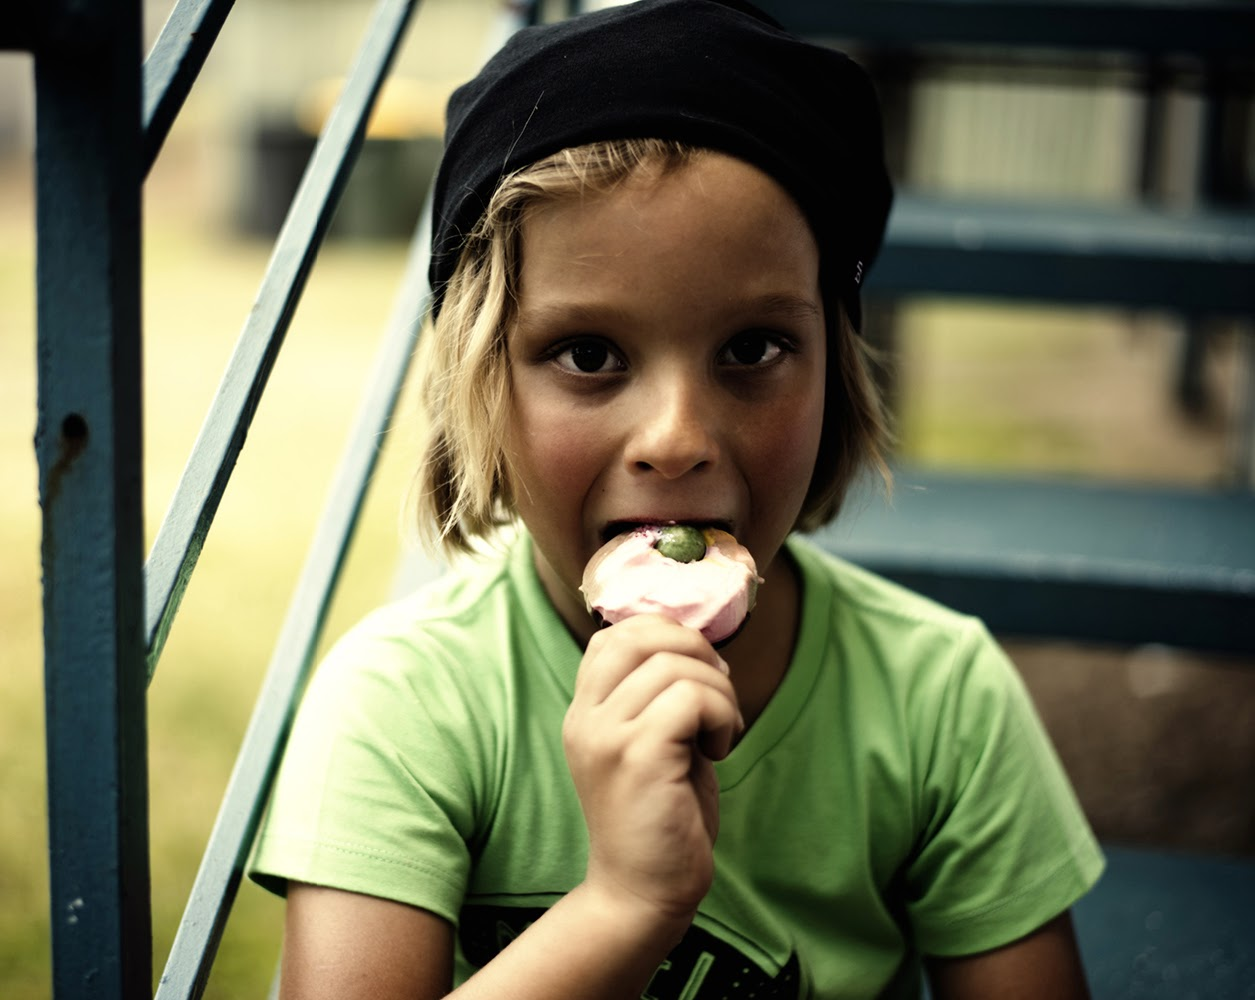 Bandit Kids SS15 preview - Australian kids clothes